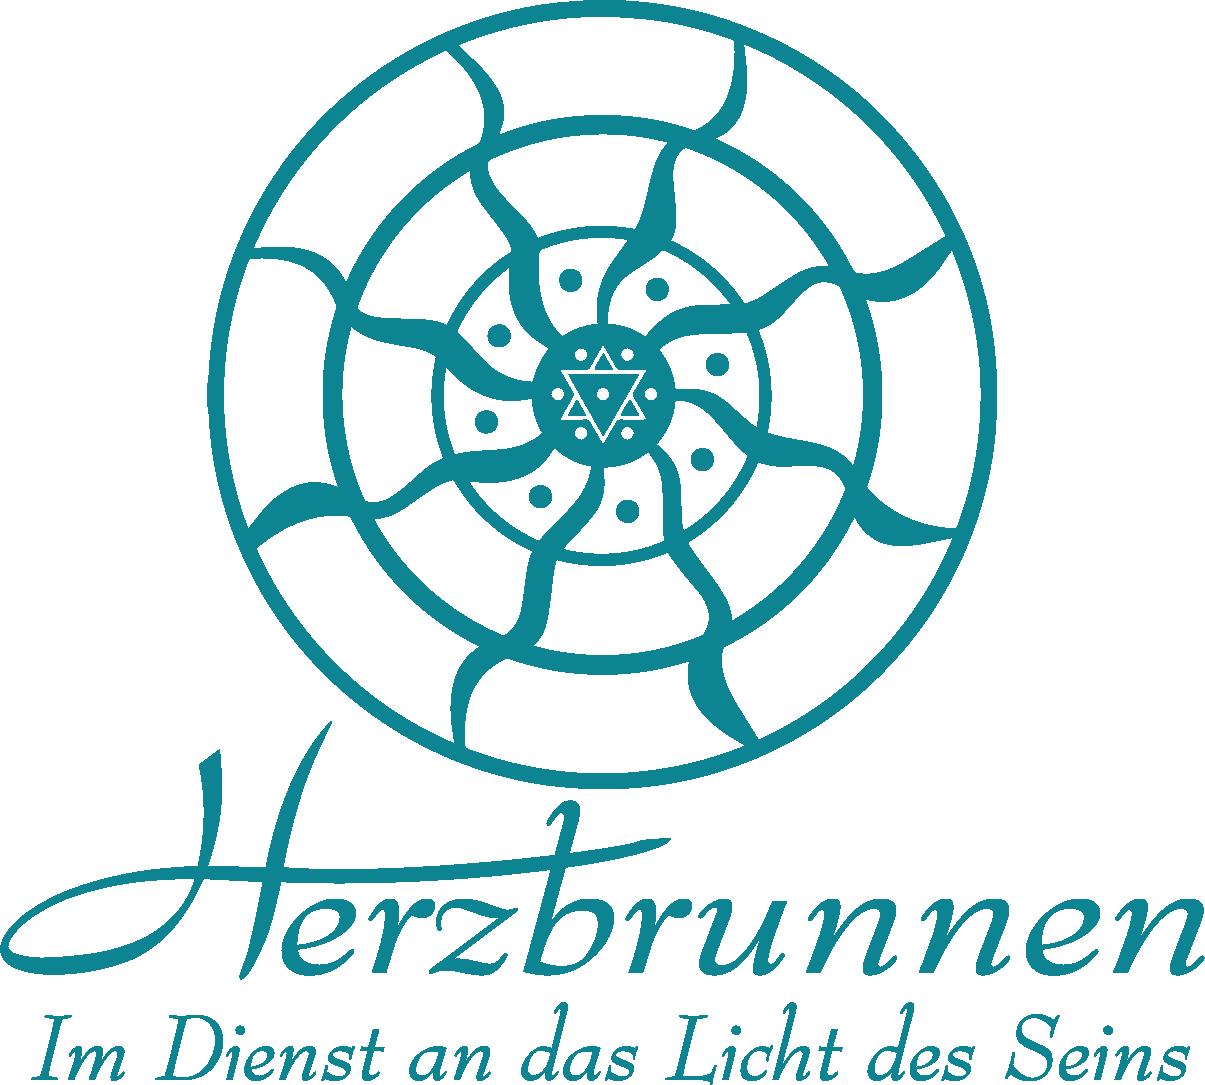 Herzbrunnen